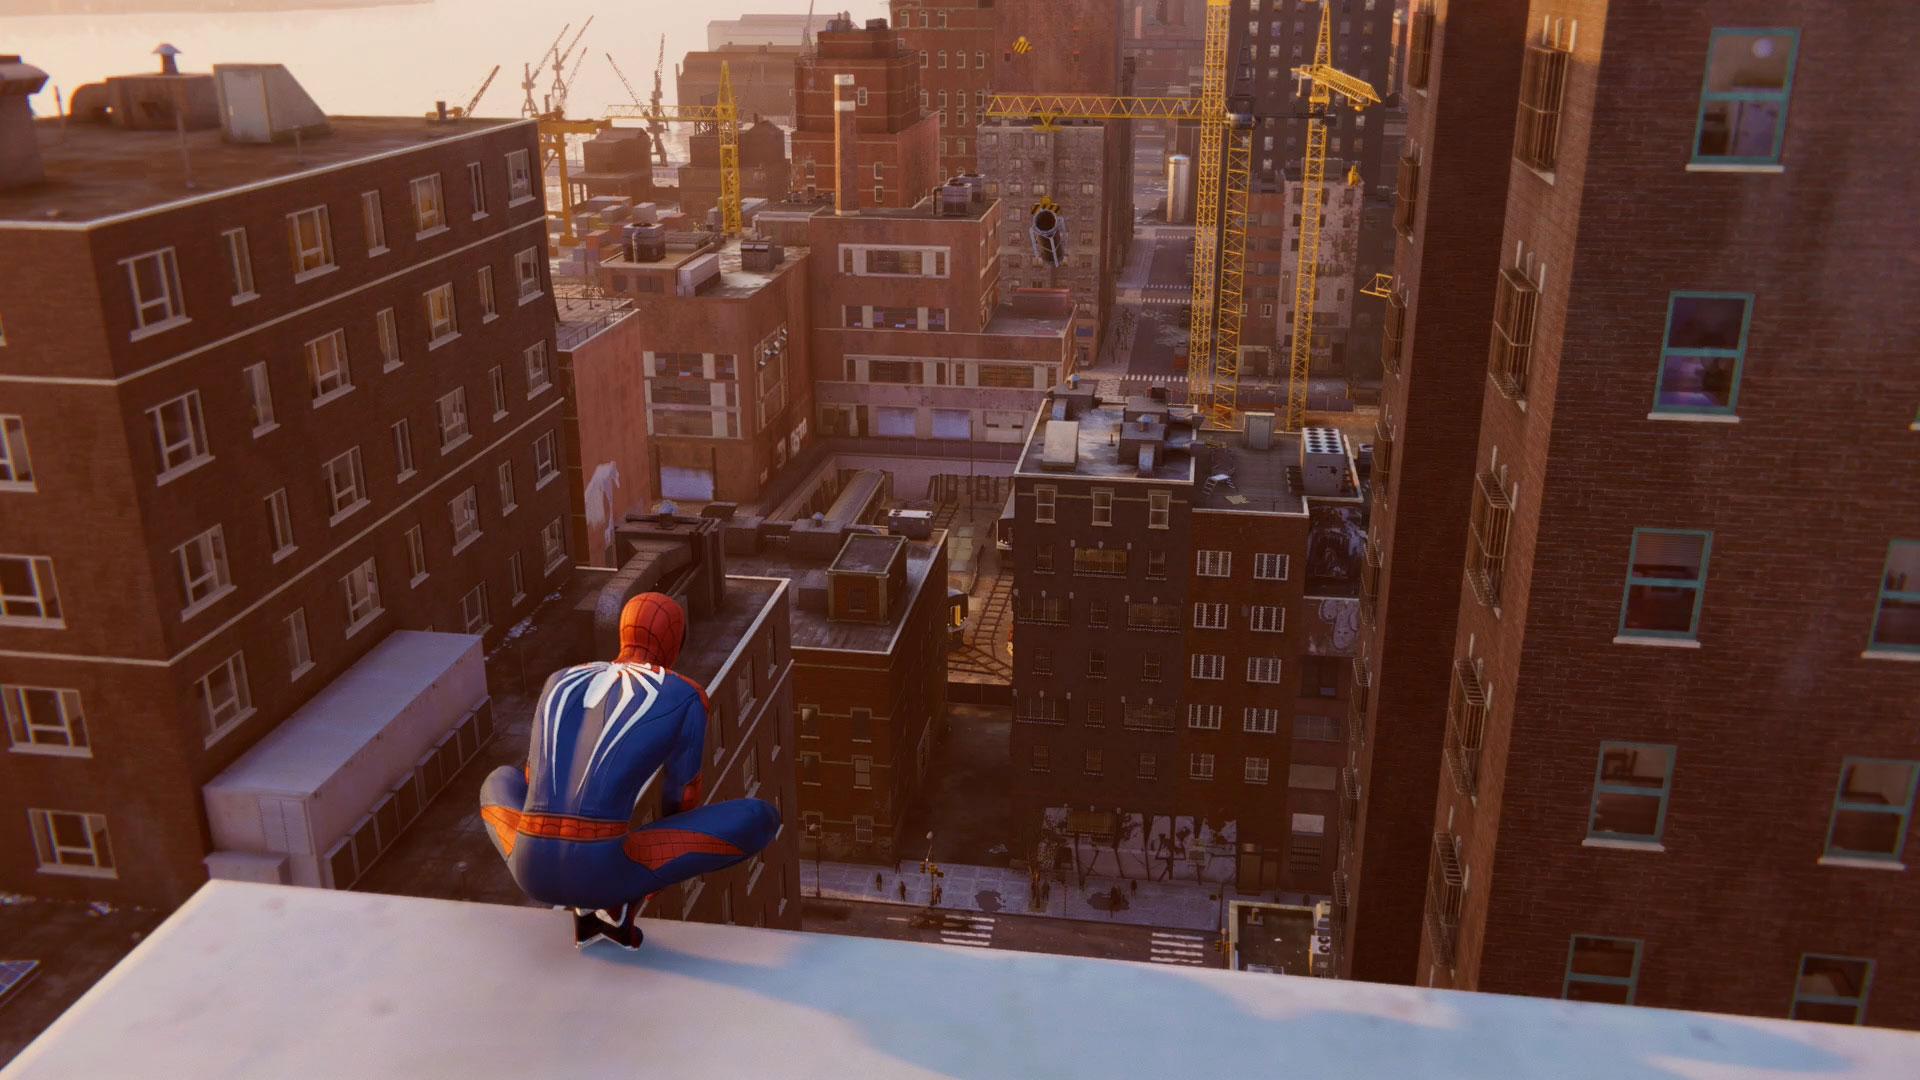 Spider-Man PS4 Bomb Challenge